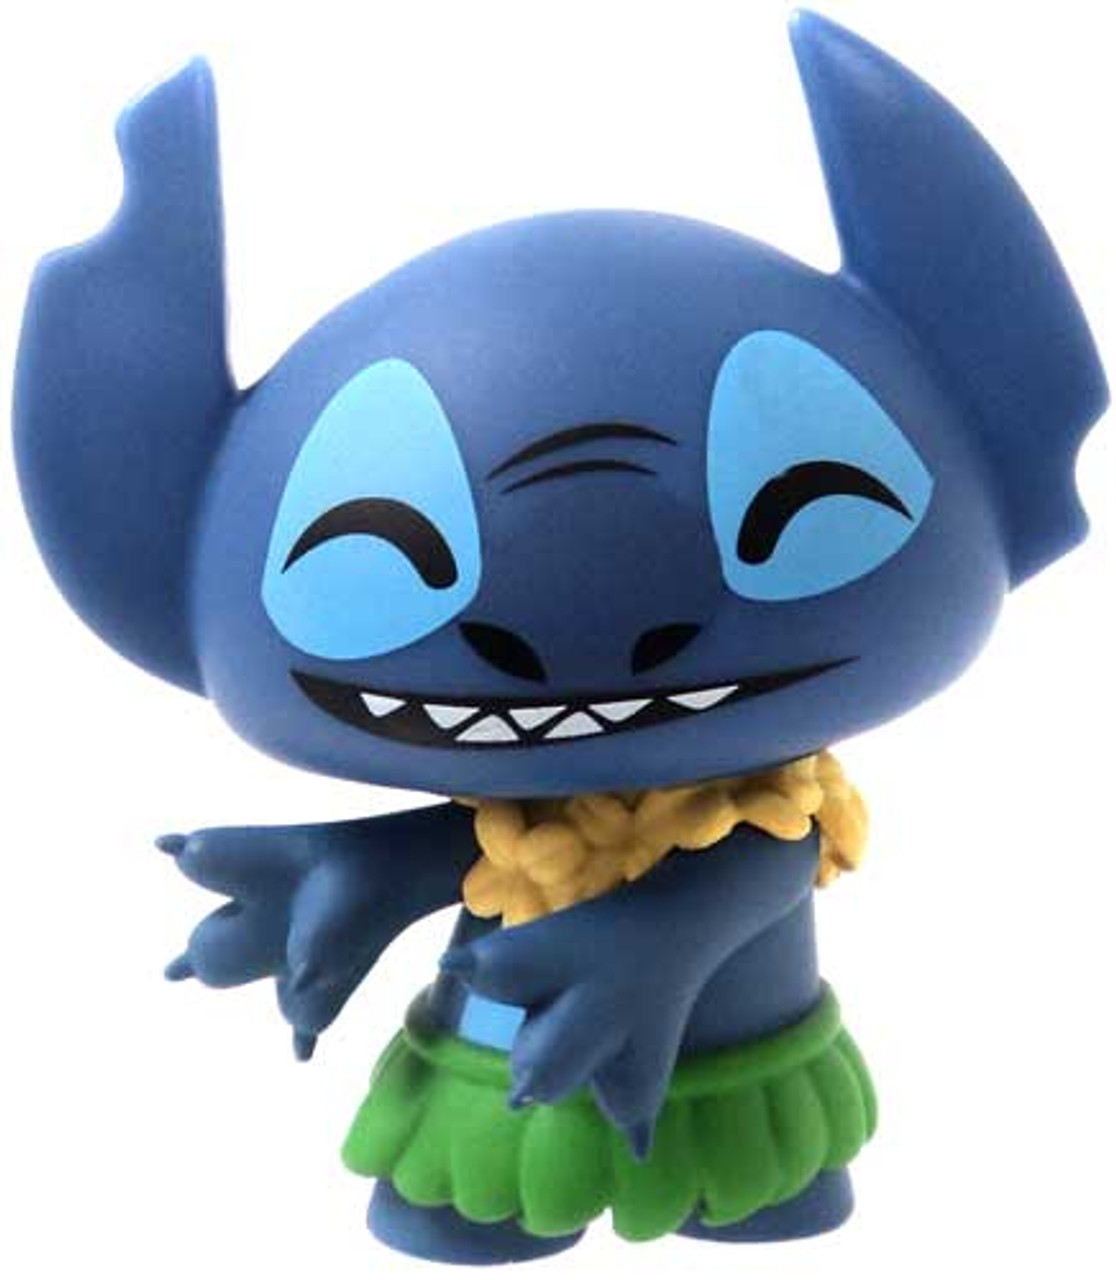 Funko Disney Lilo & Stitch Mystery Minis Series 1 Stitch Vinyl Mini Figure [Hula, Eyes Closed Loose]